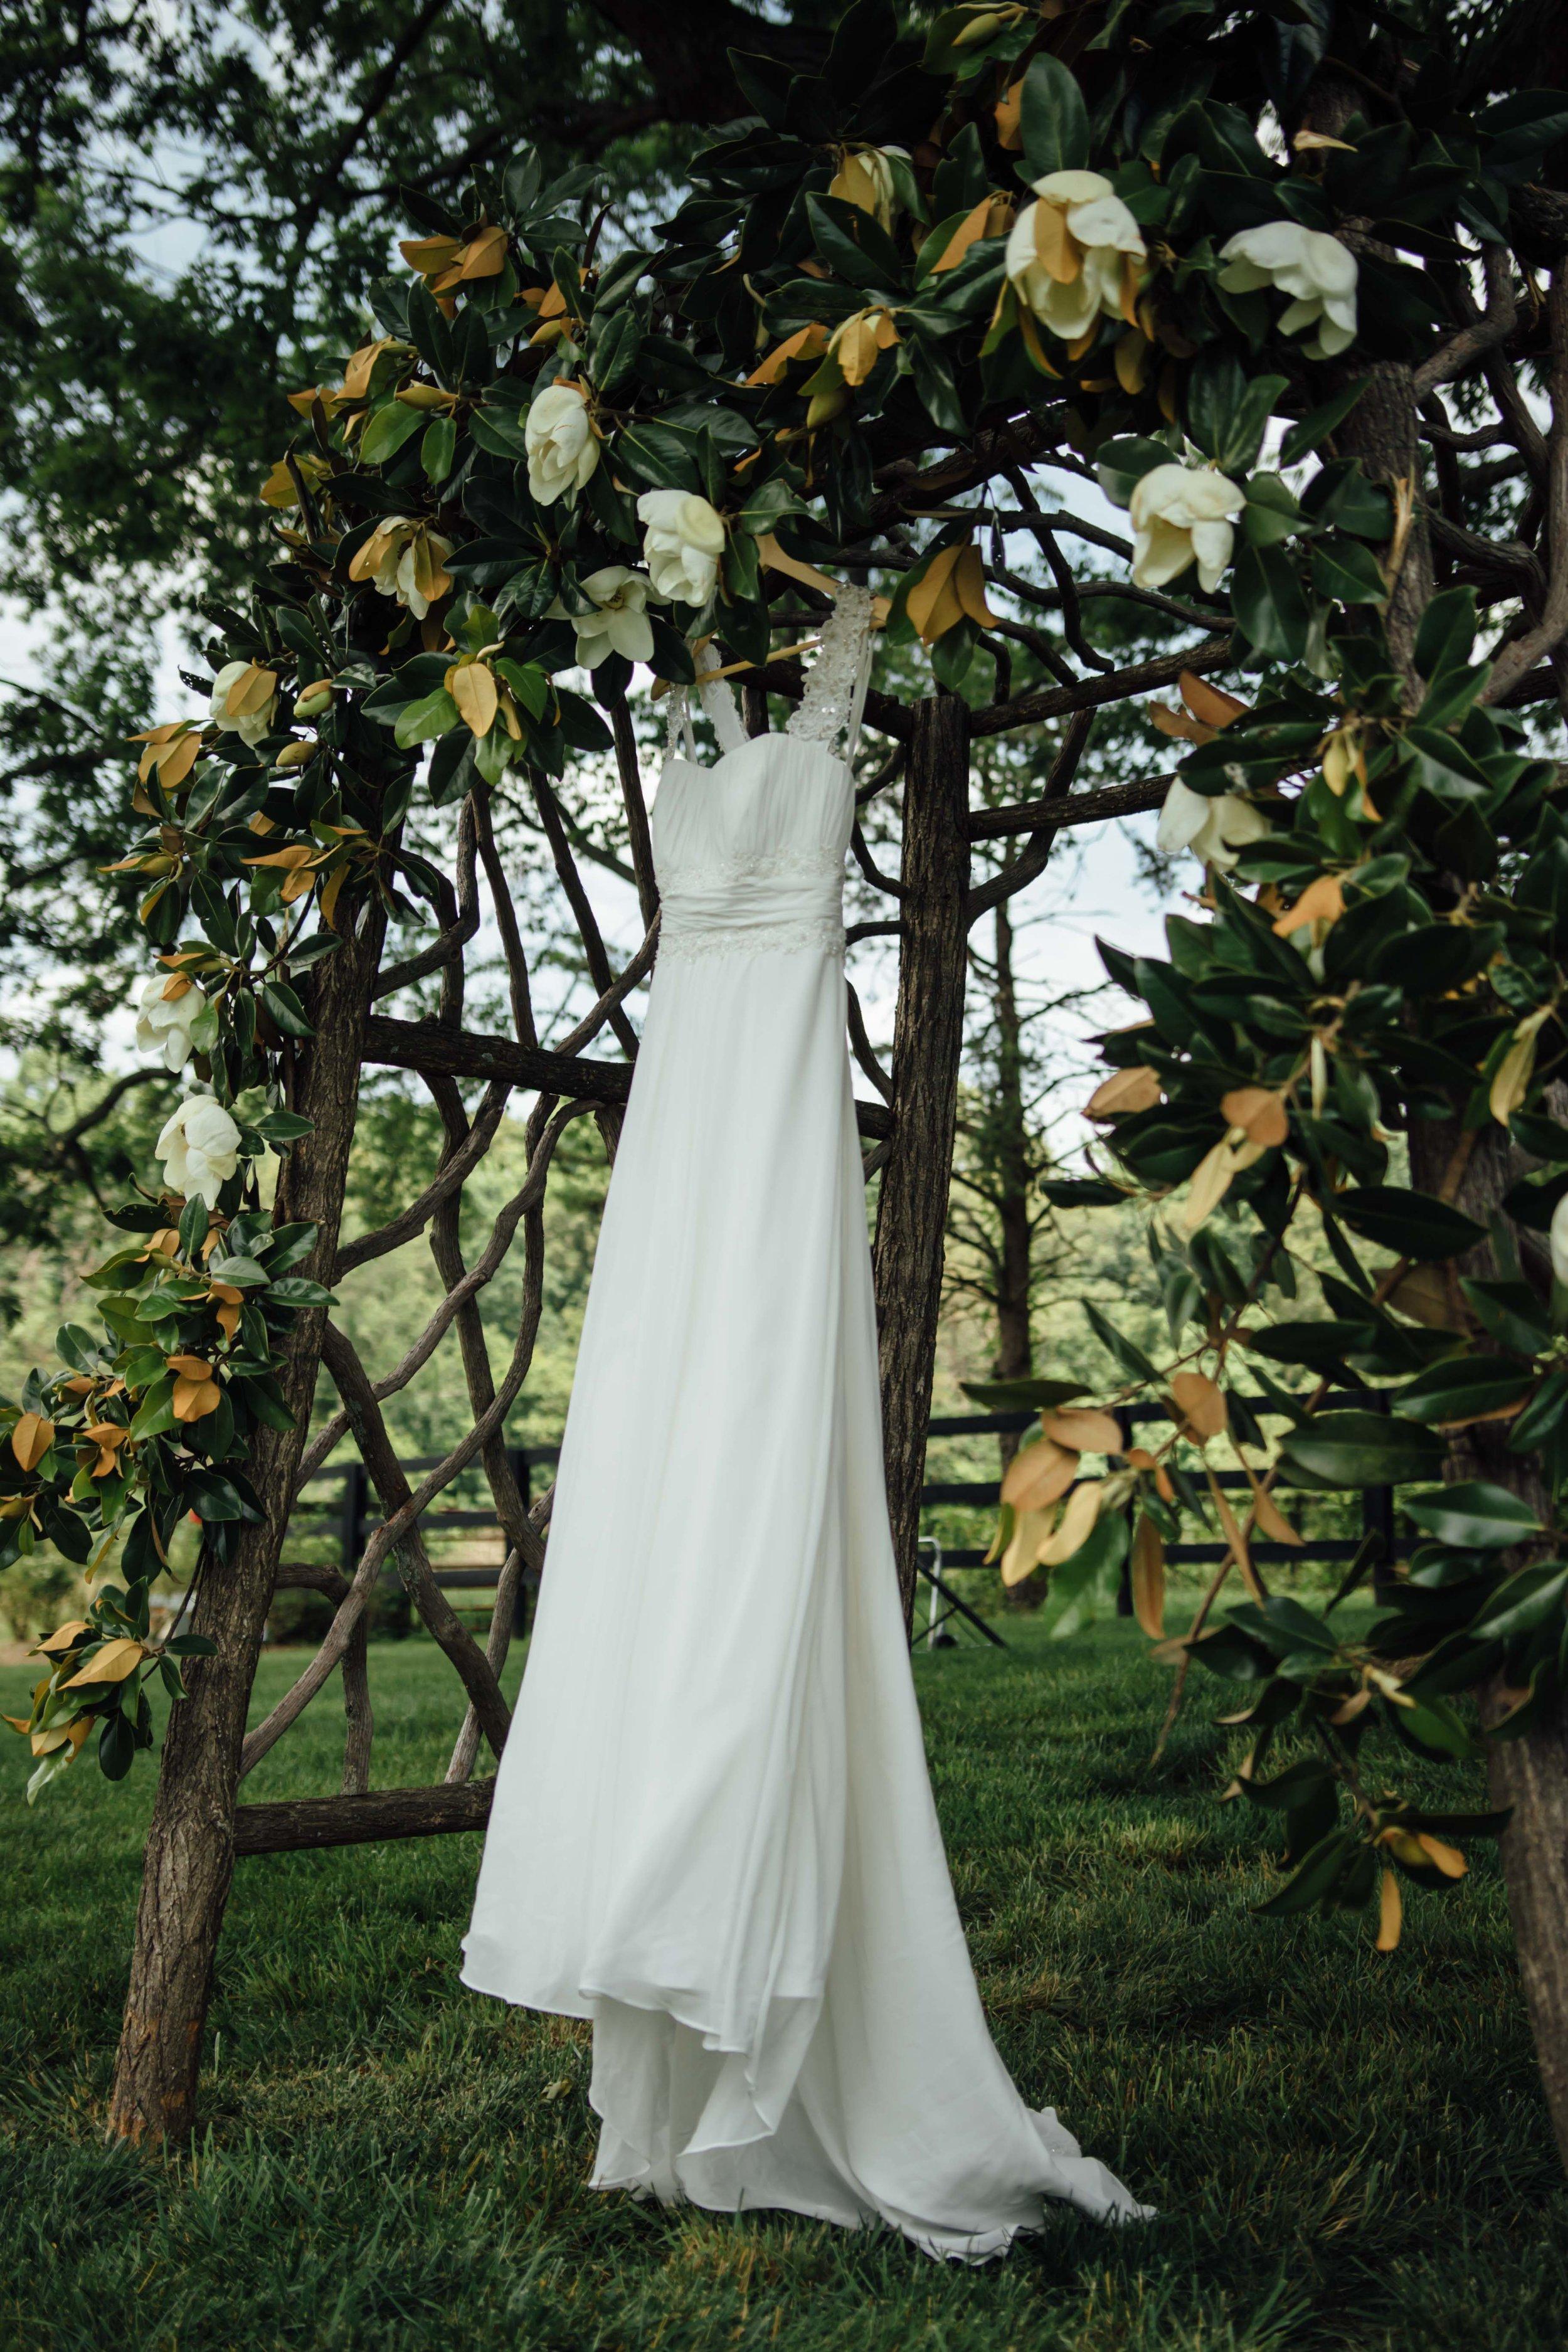 beautiful shot of the wedding dress